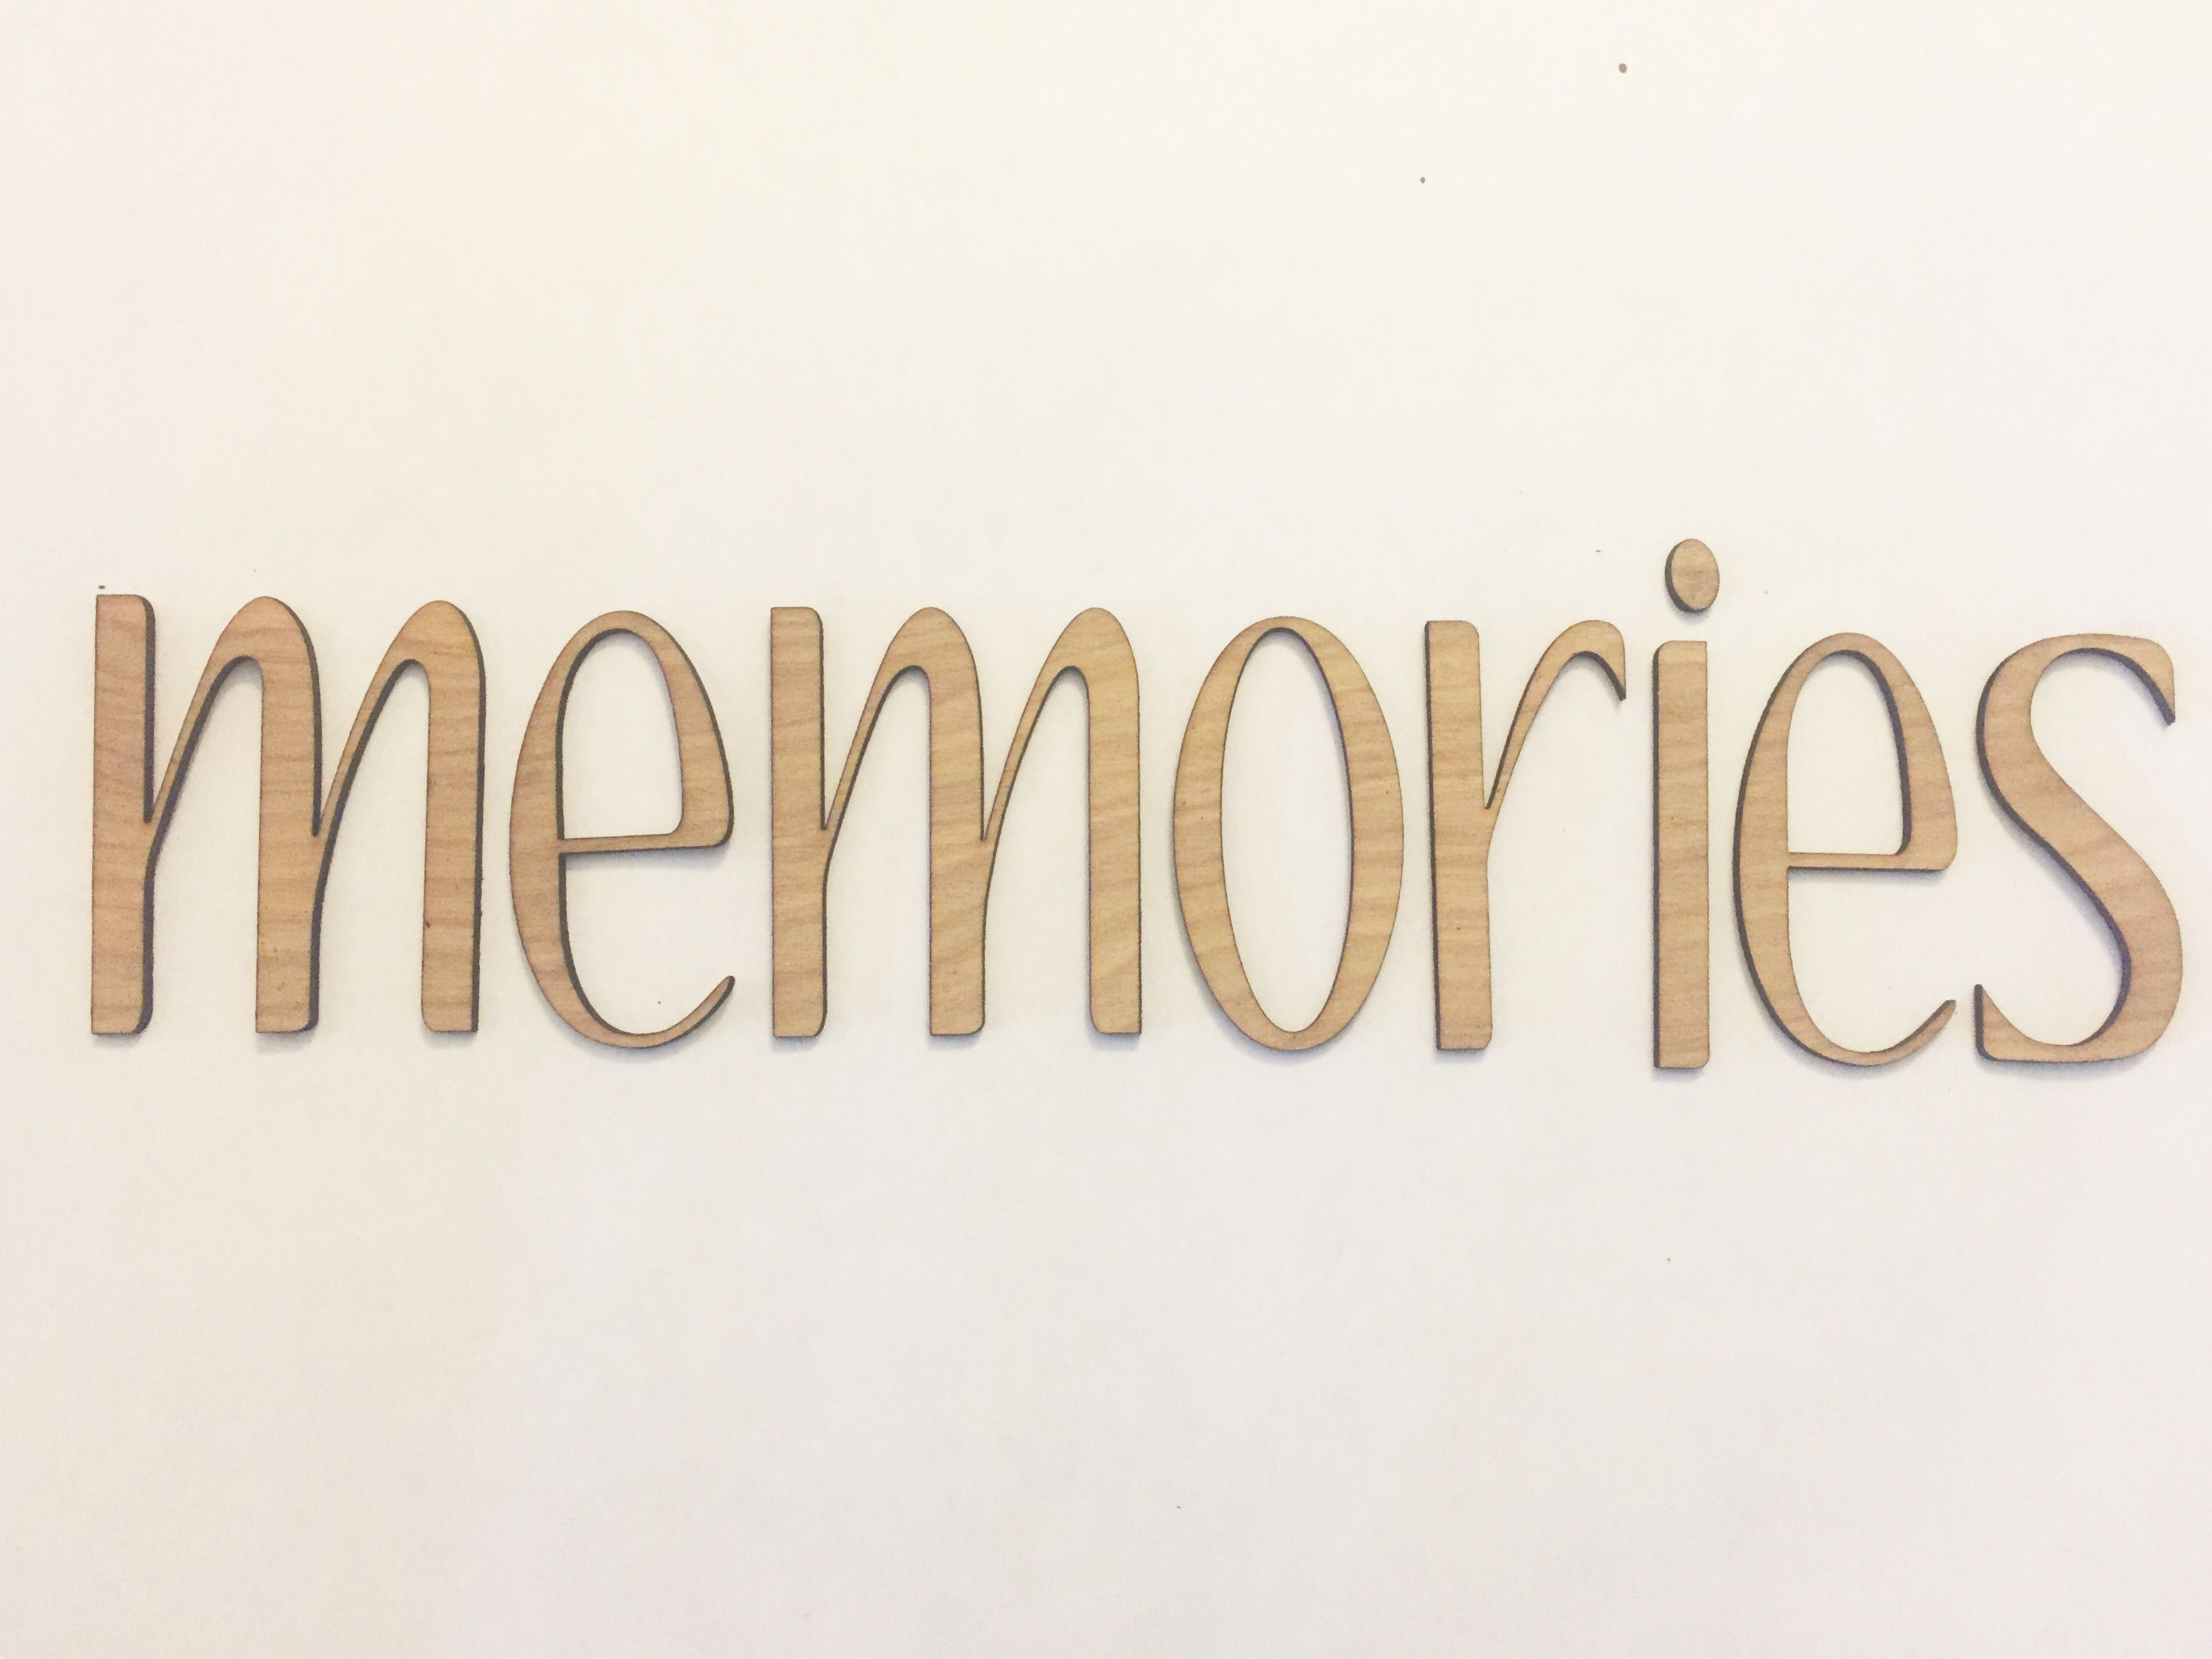 Memories diy wood word craftsposure maker of the month pinterest